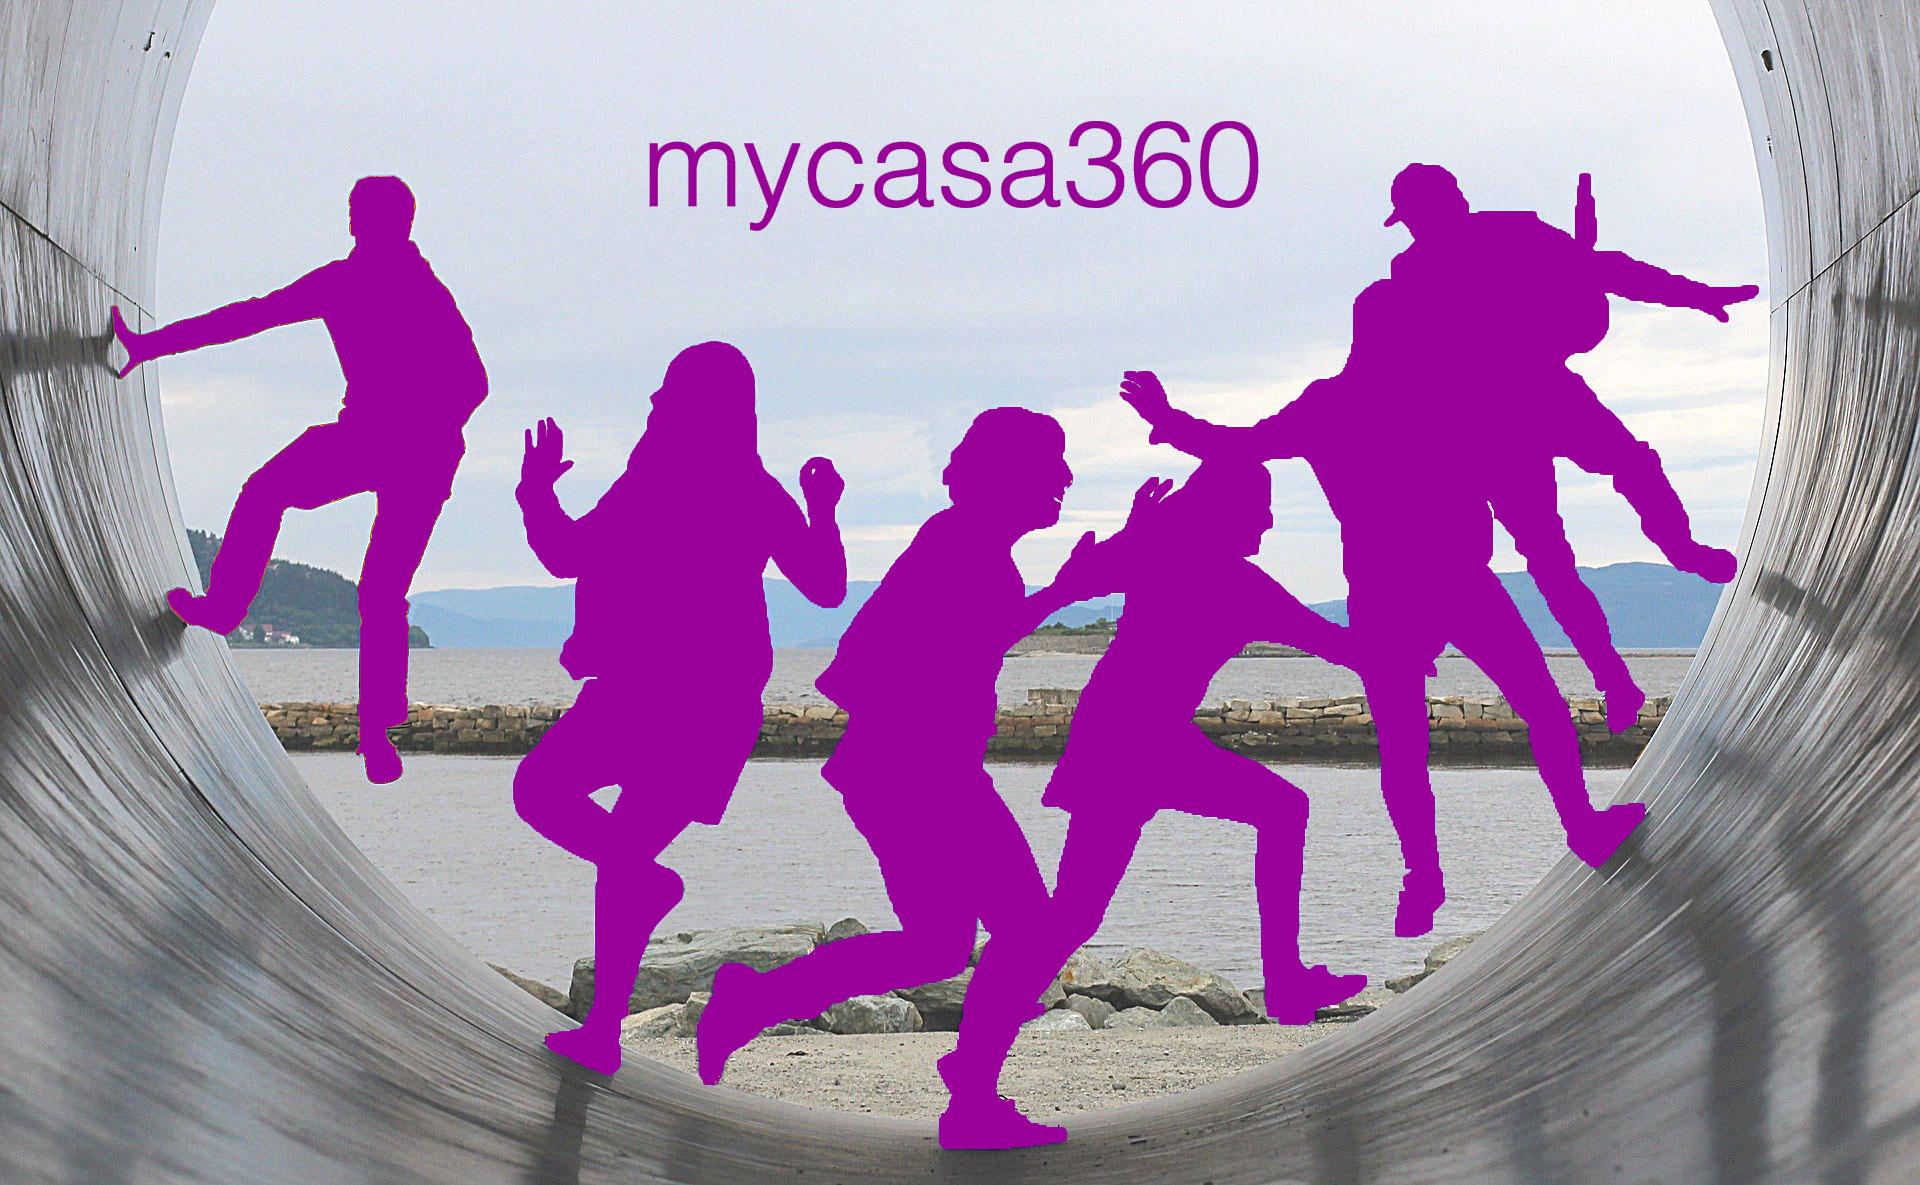 orange-color-team-mycasa360